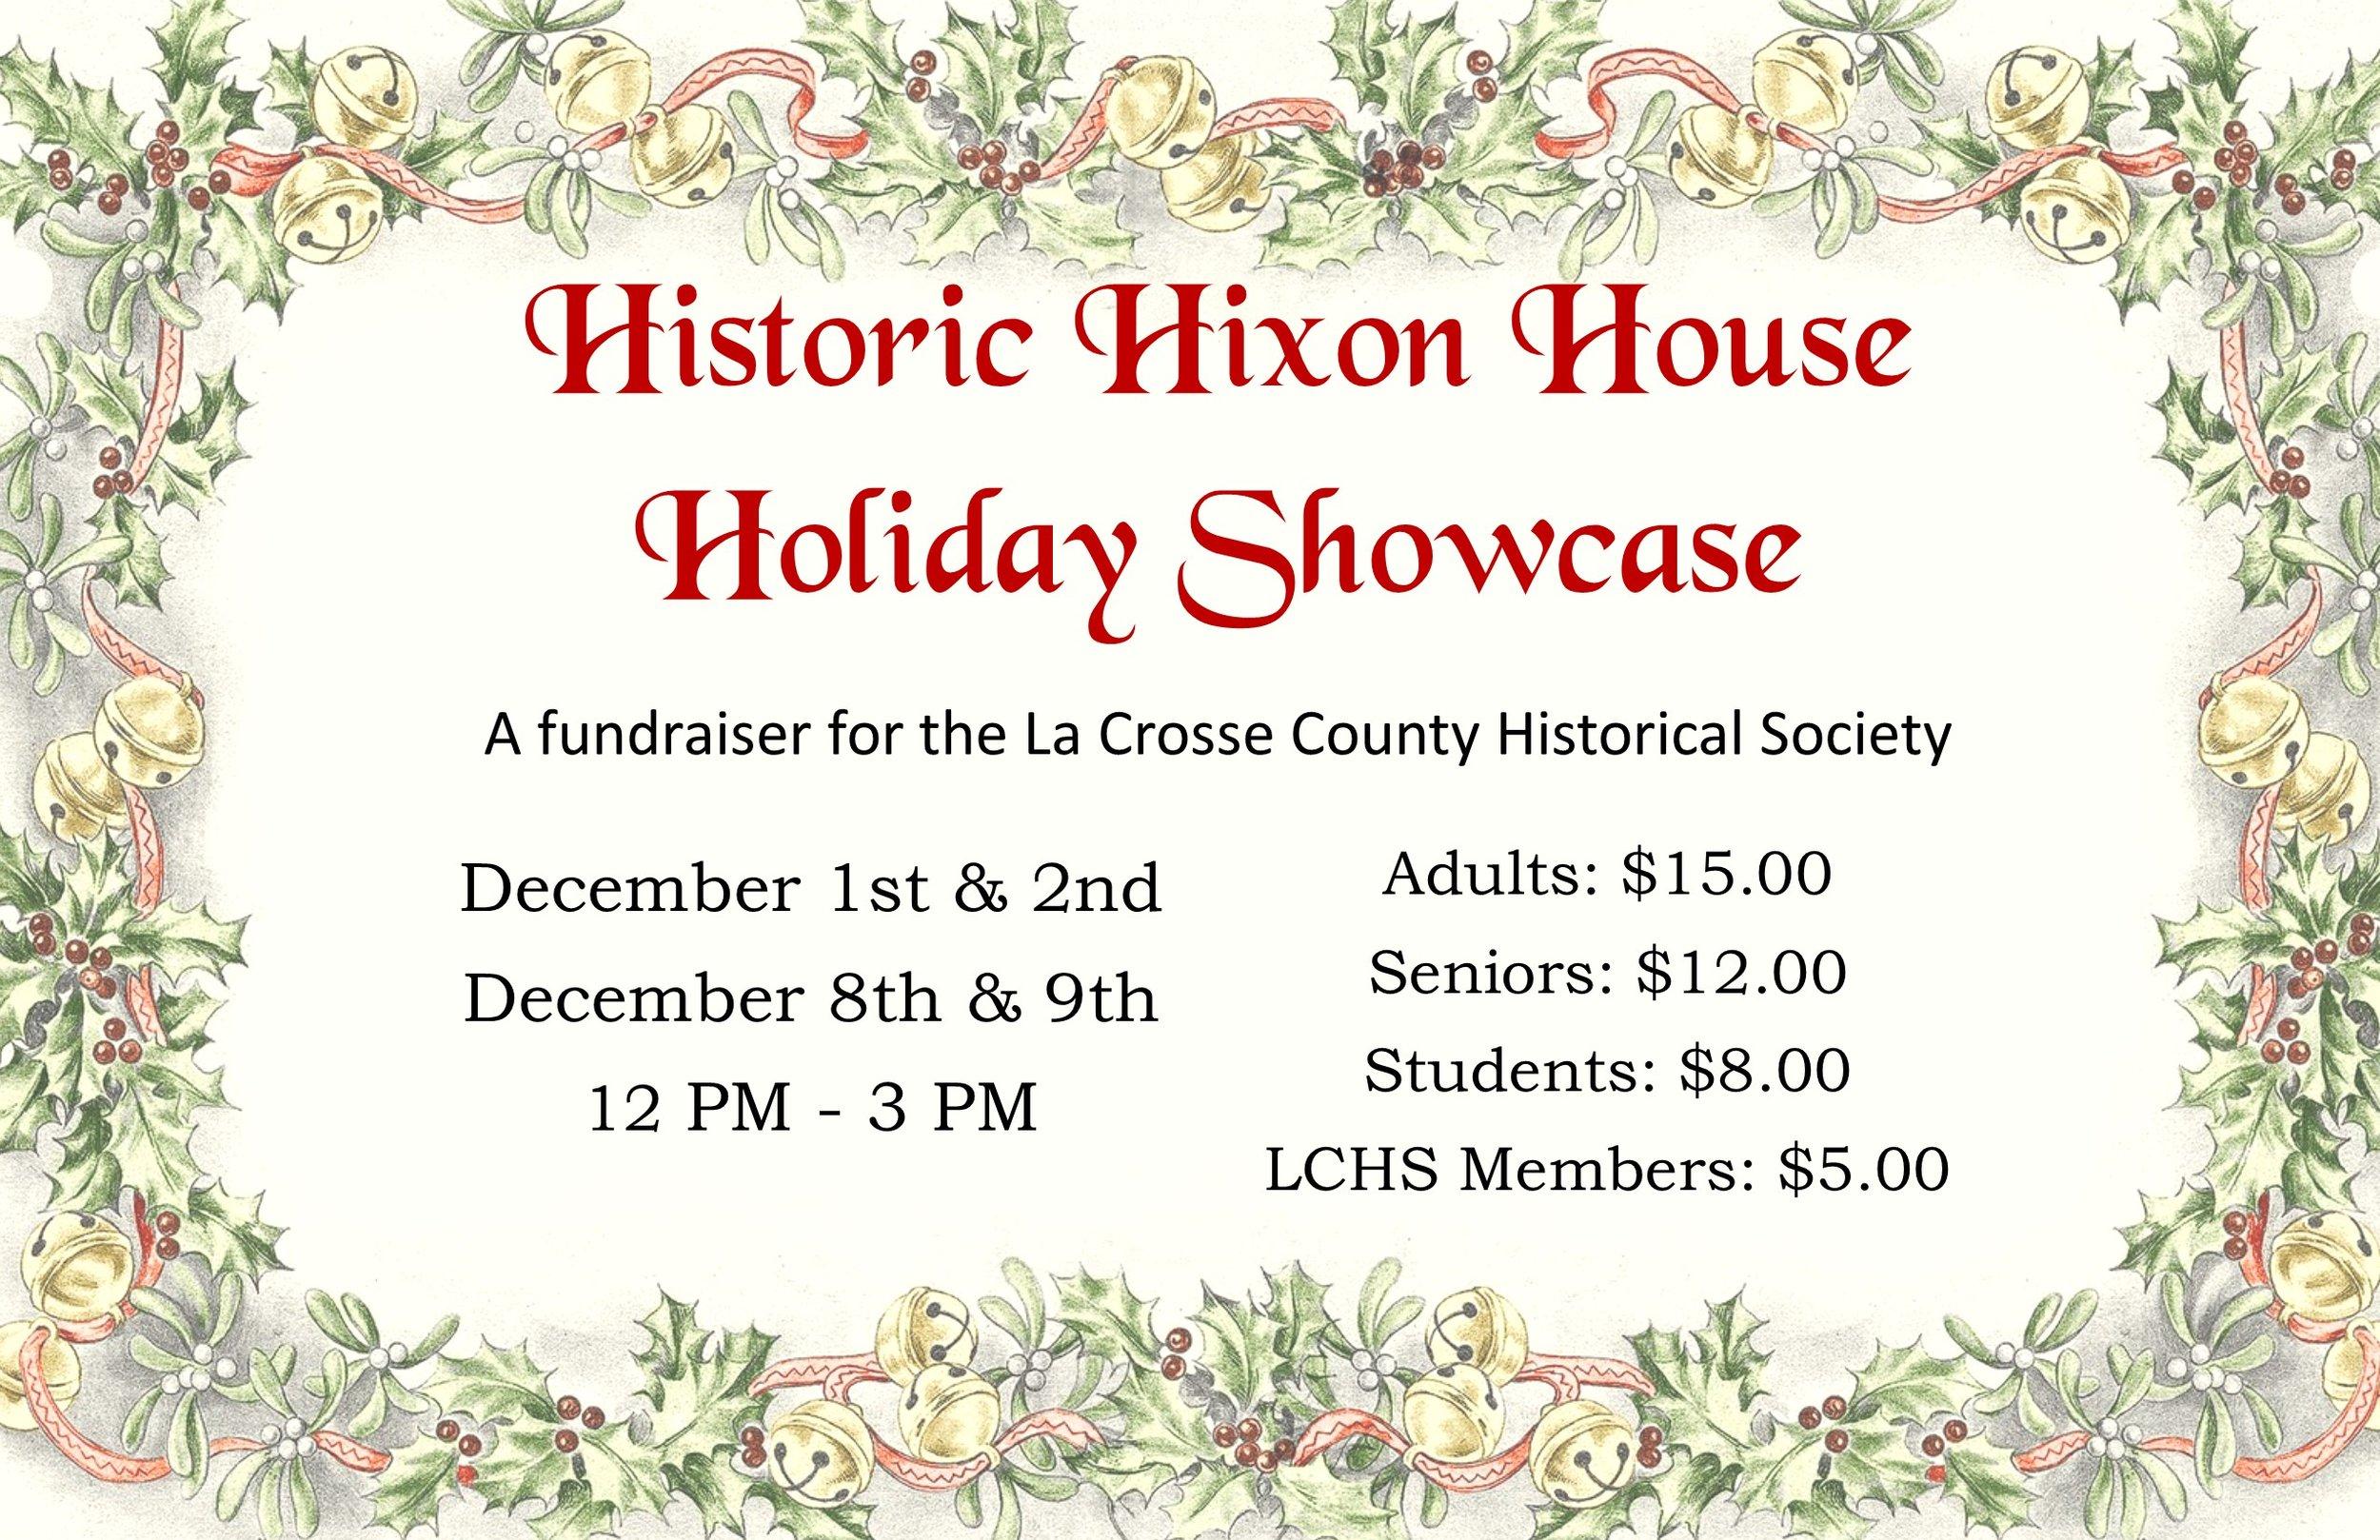 Hixon House Holiday Showcase 2018.jpg